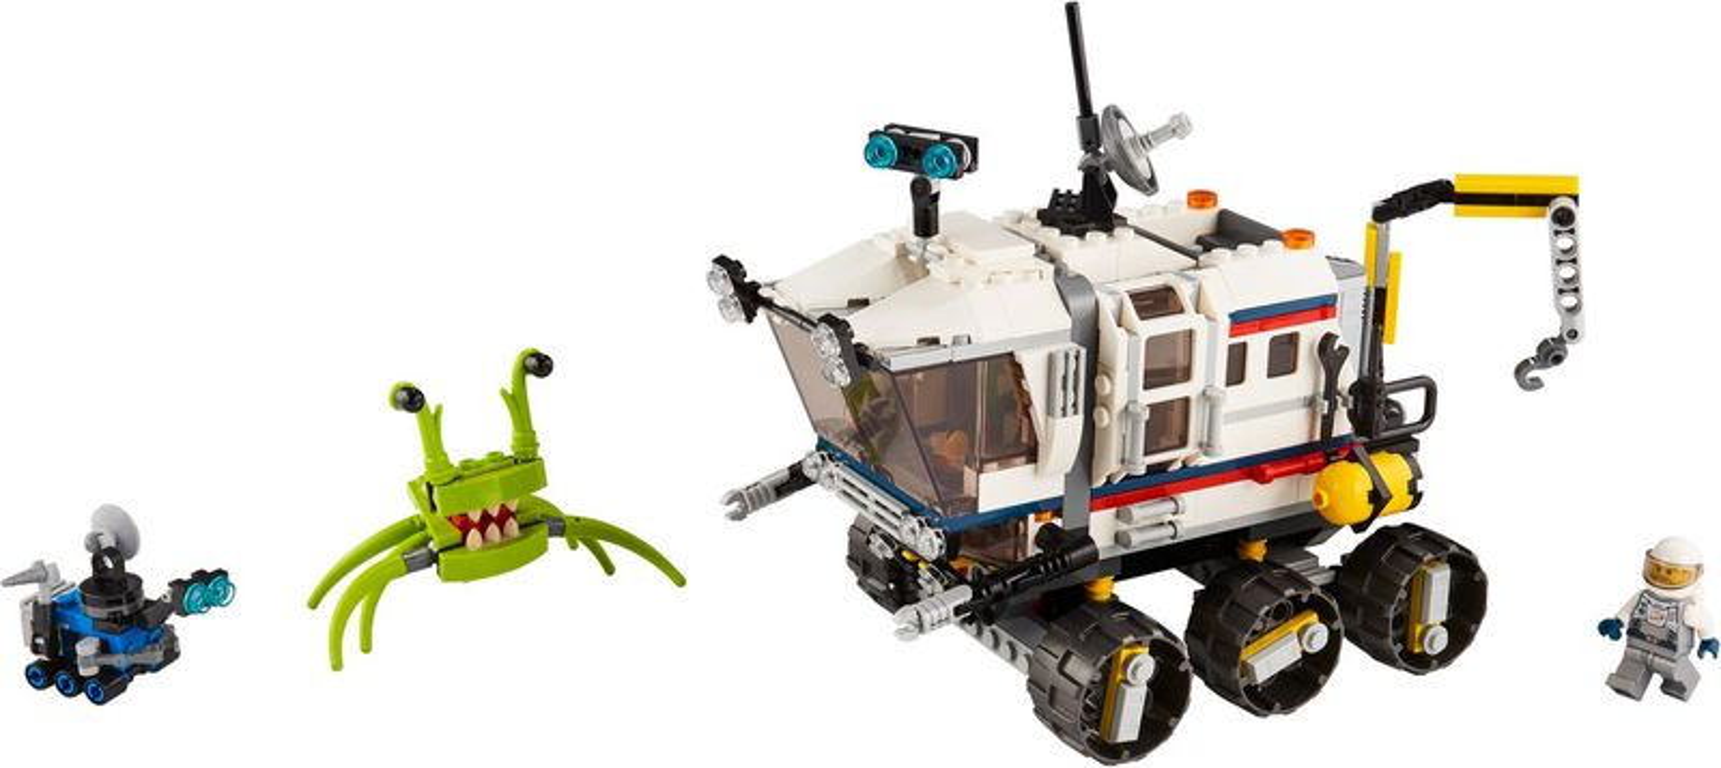 LEGO® Creator Space Rover Explorer components